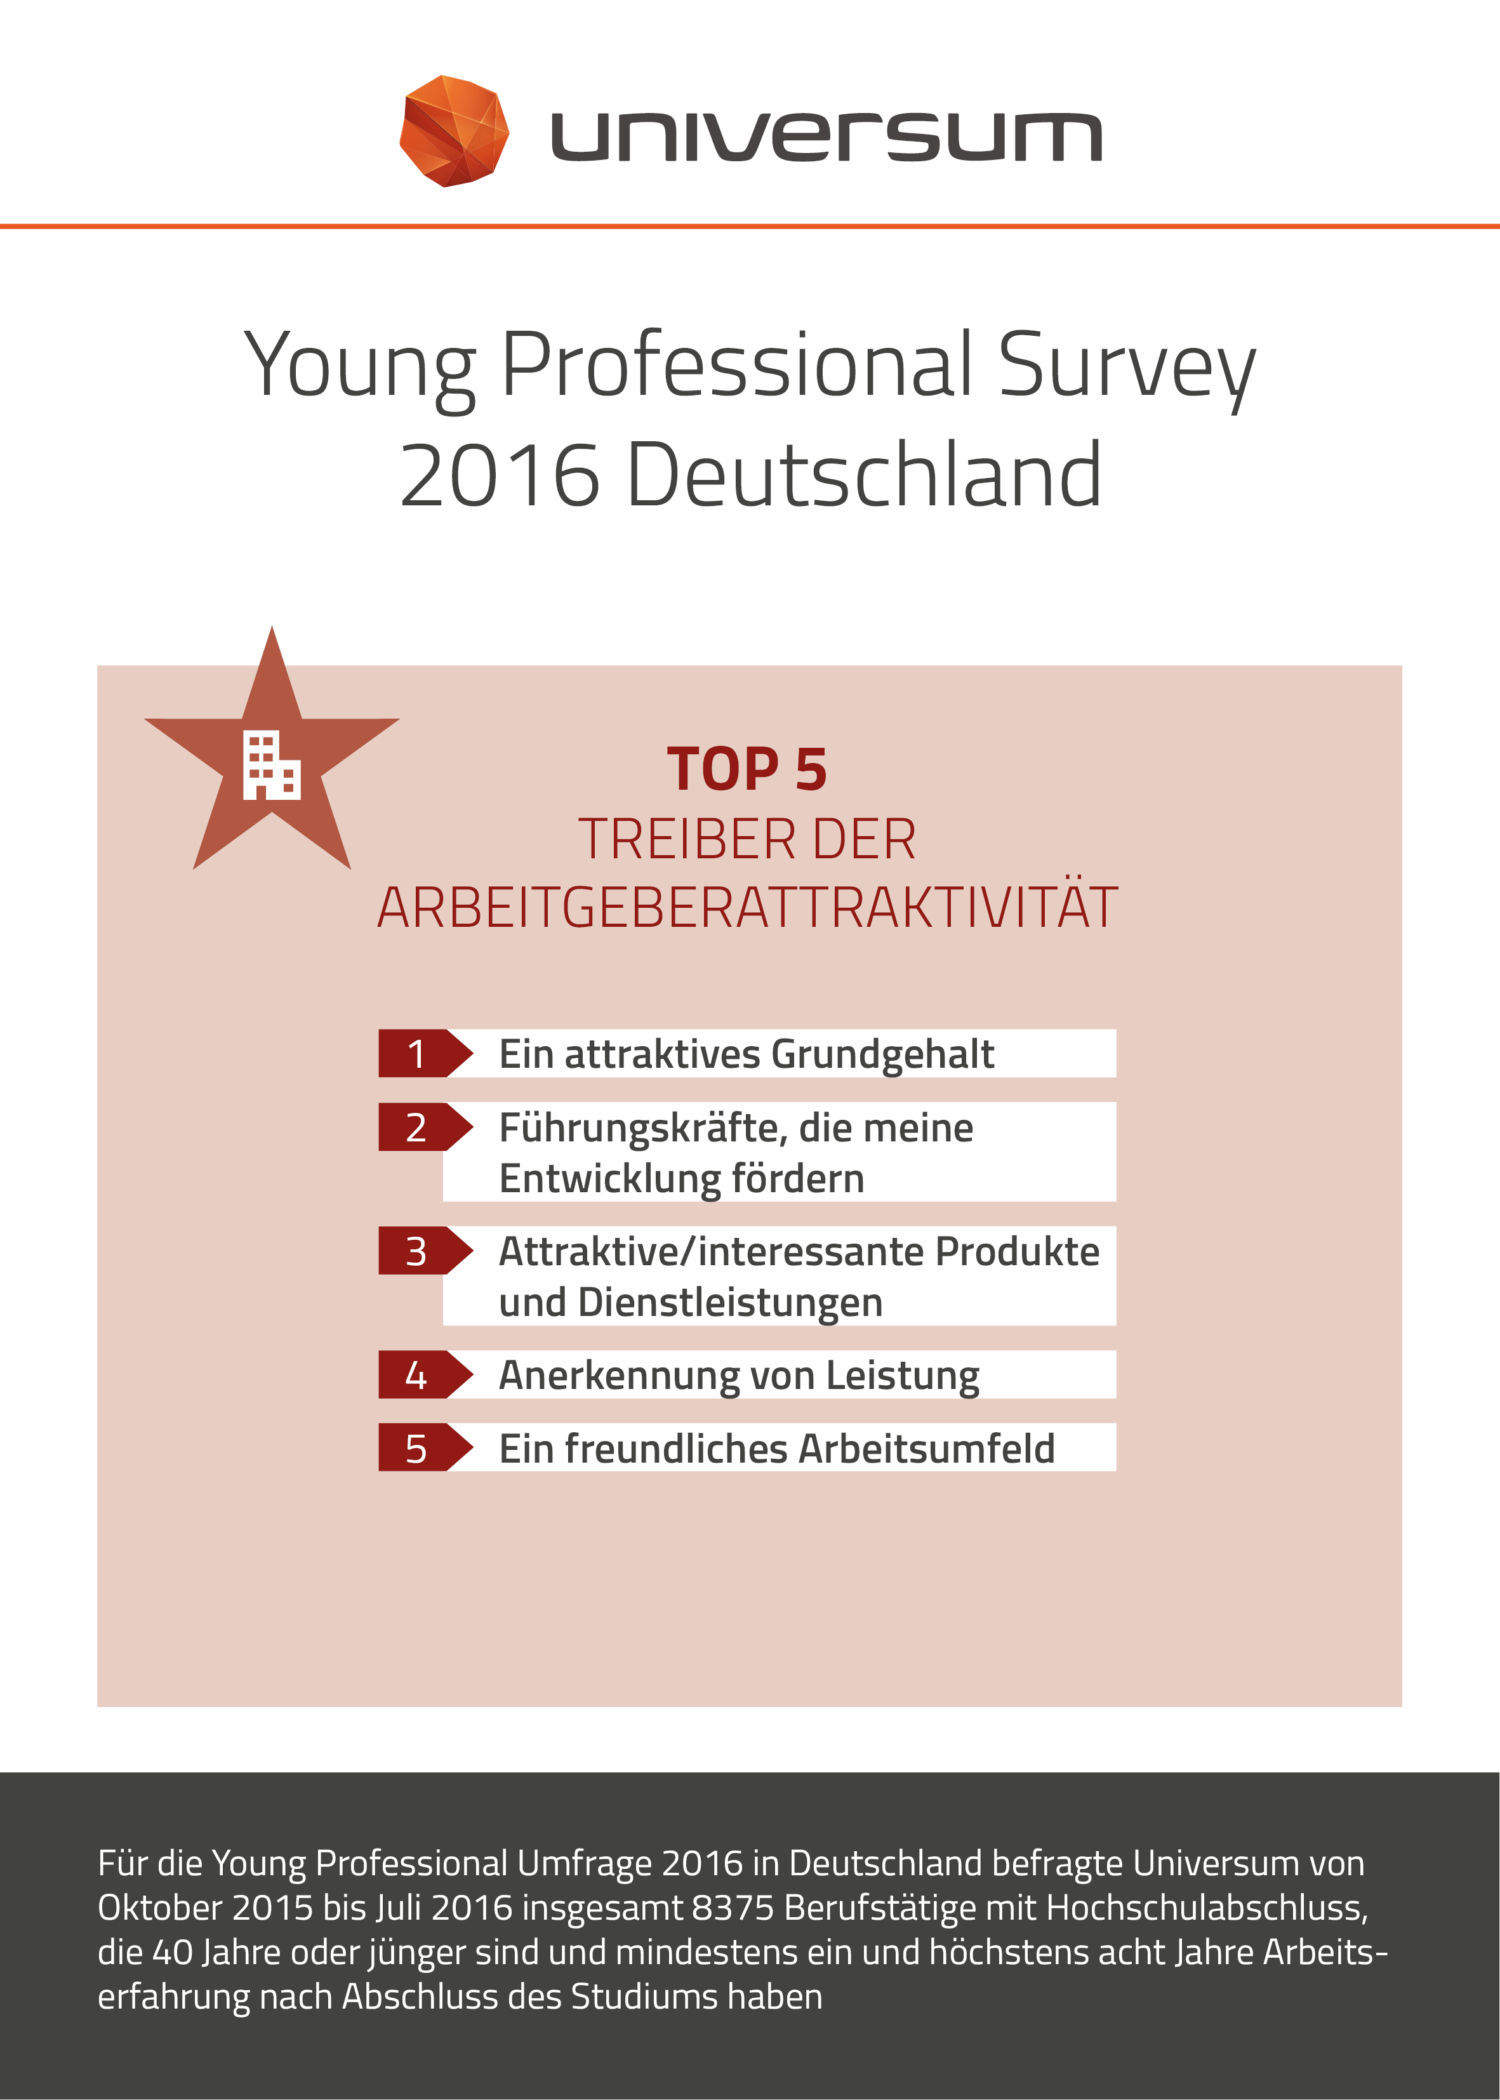 YPS DE 2016 Treiber der Arbeitgeberatt